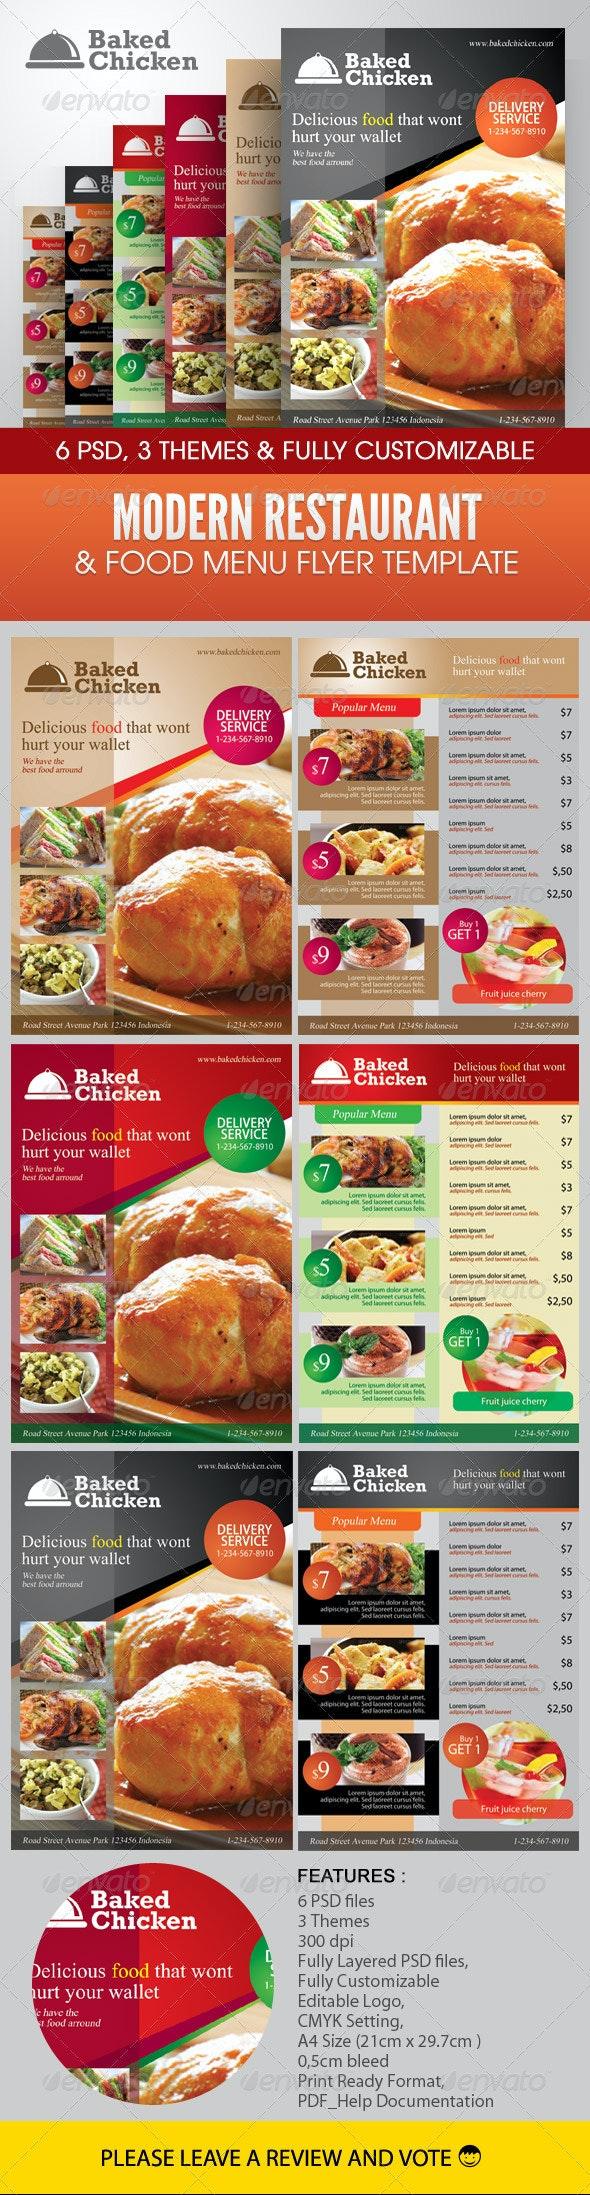 Modern Restaurant Food Menu Flyer Template - Food Menus Print Templates